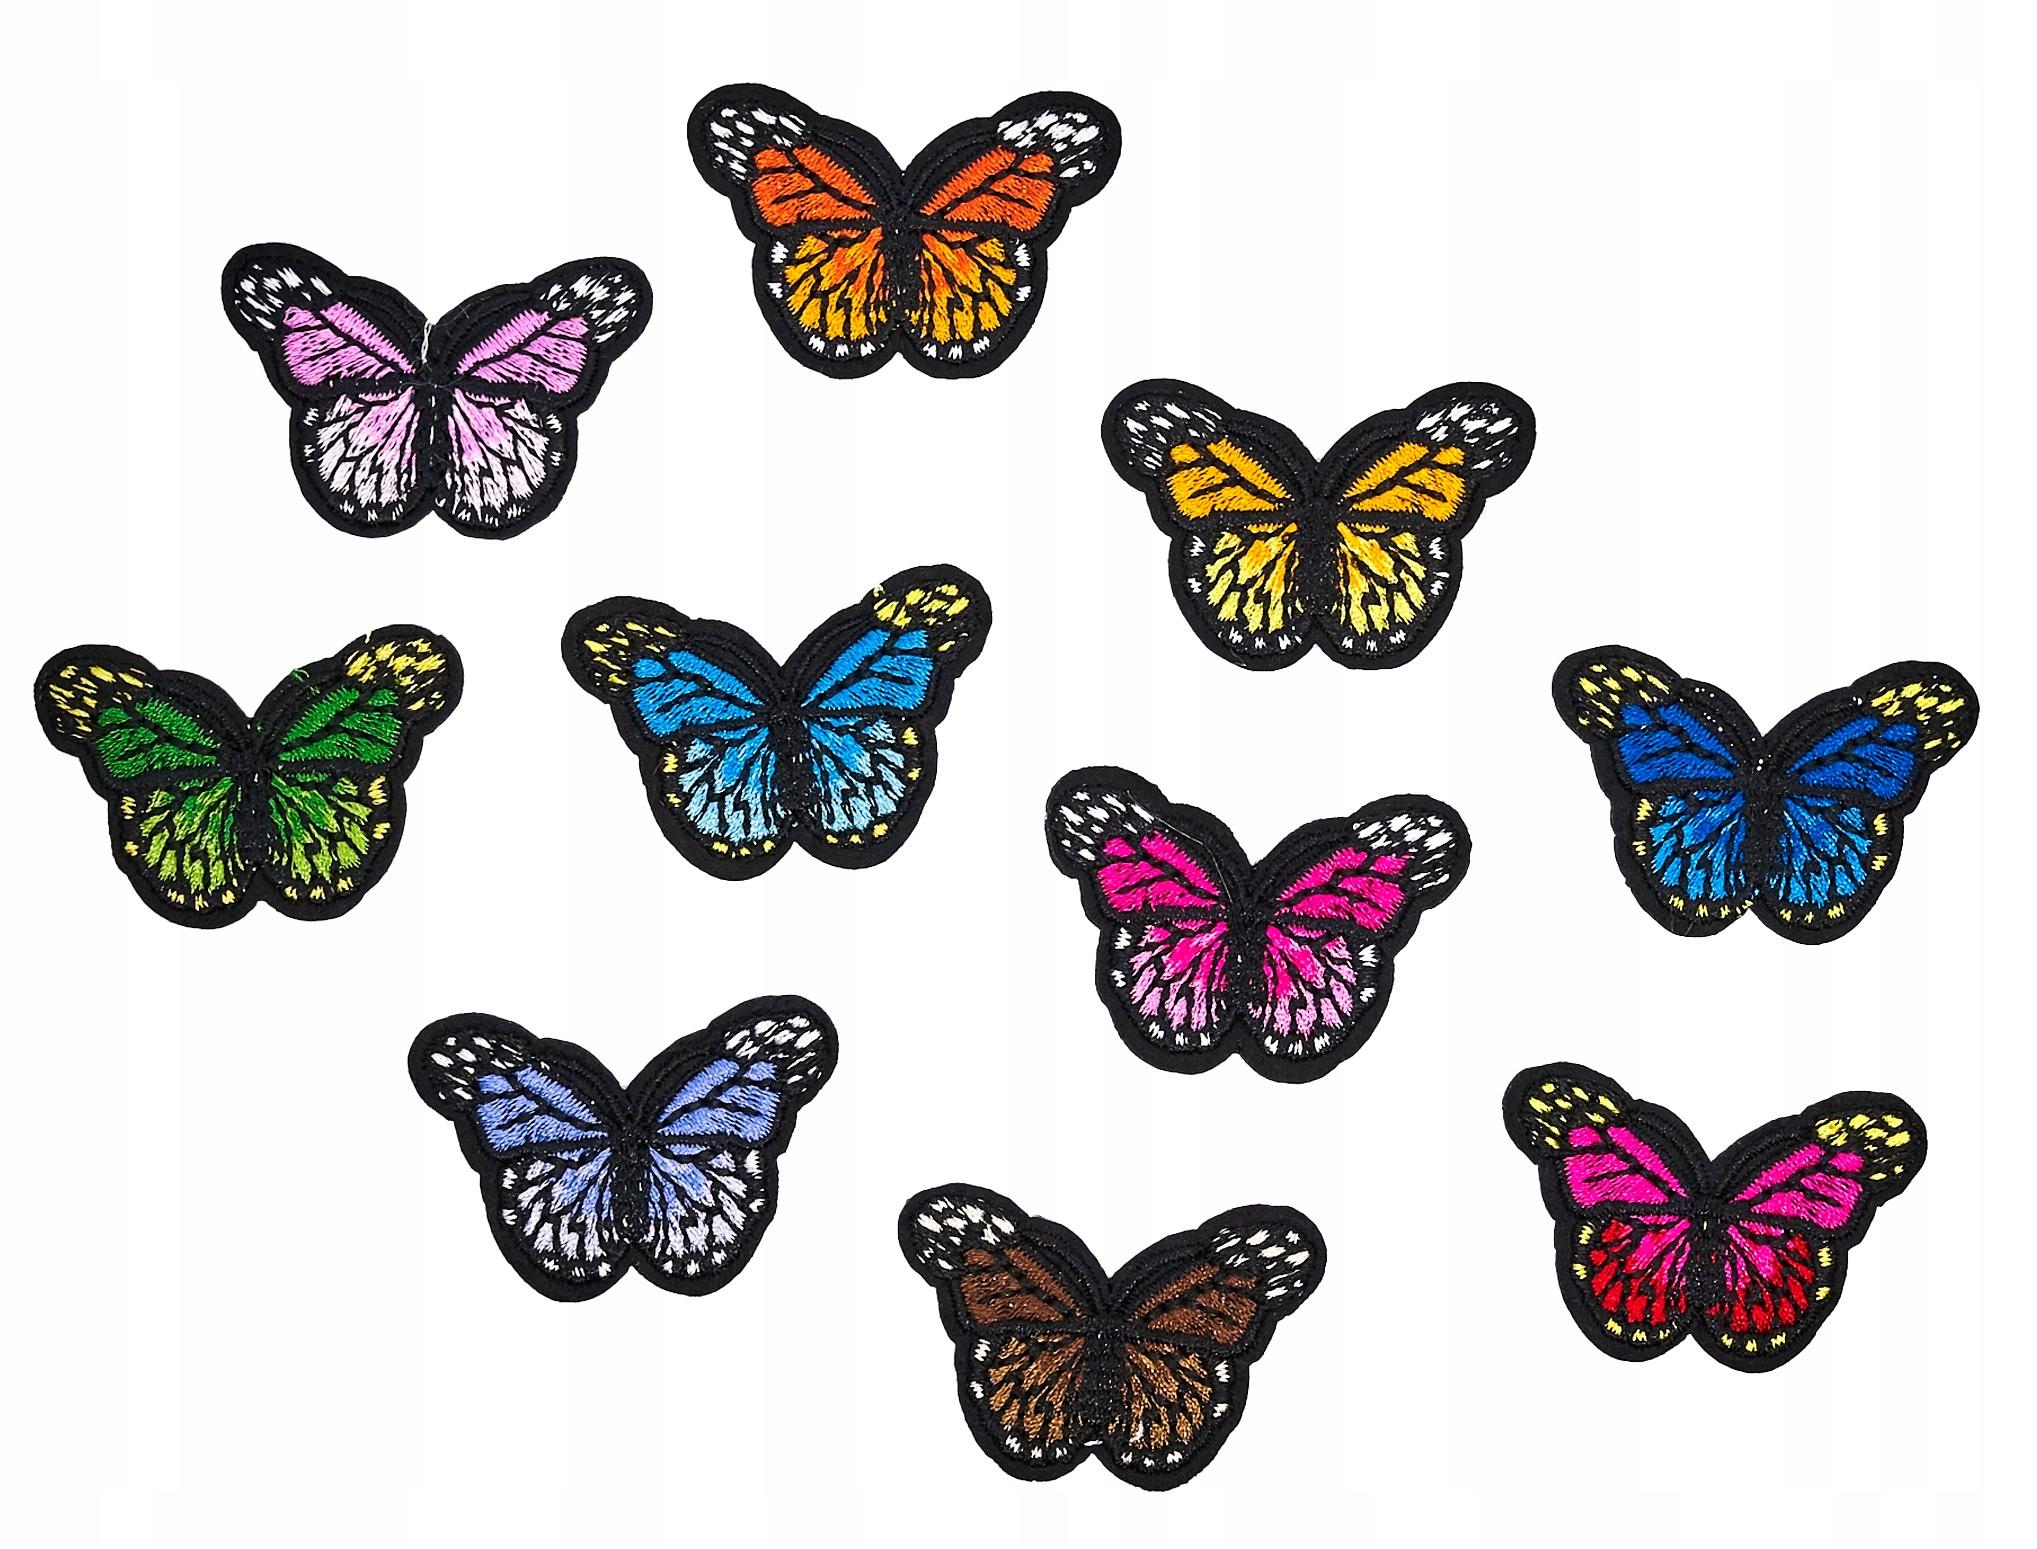 Motyle Naszywki Termo Naprasowanki Zestaw 10 Szt 8881732170 Allegro Pl